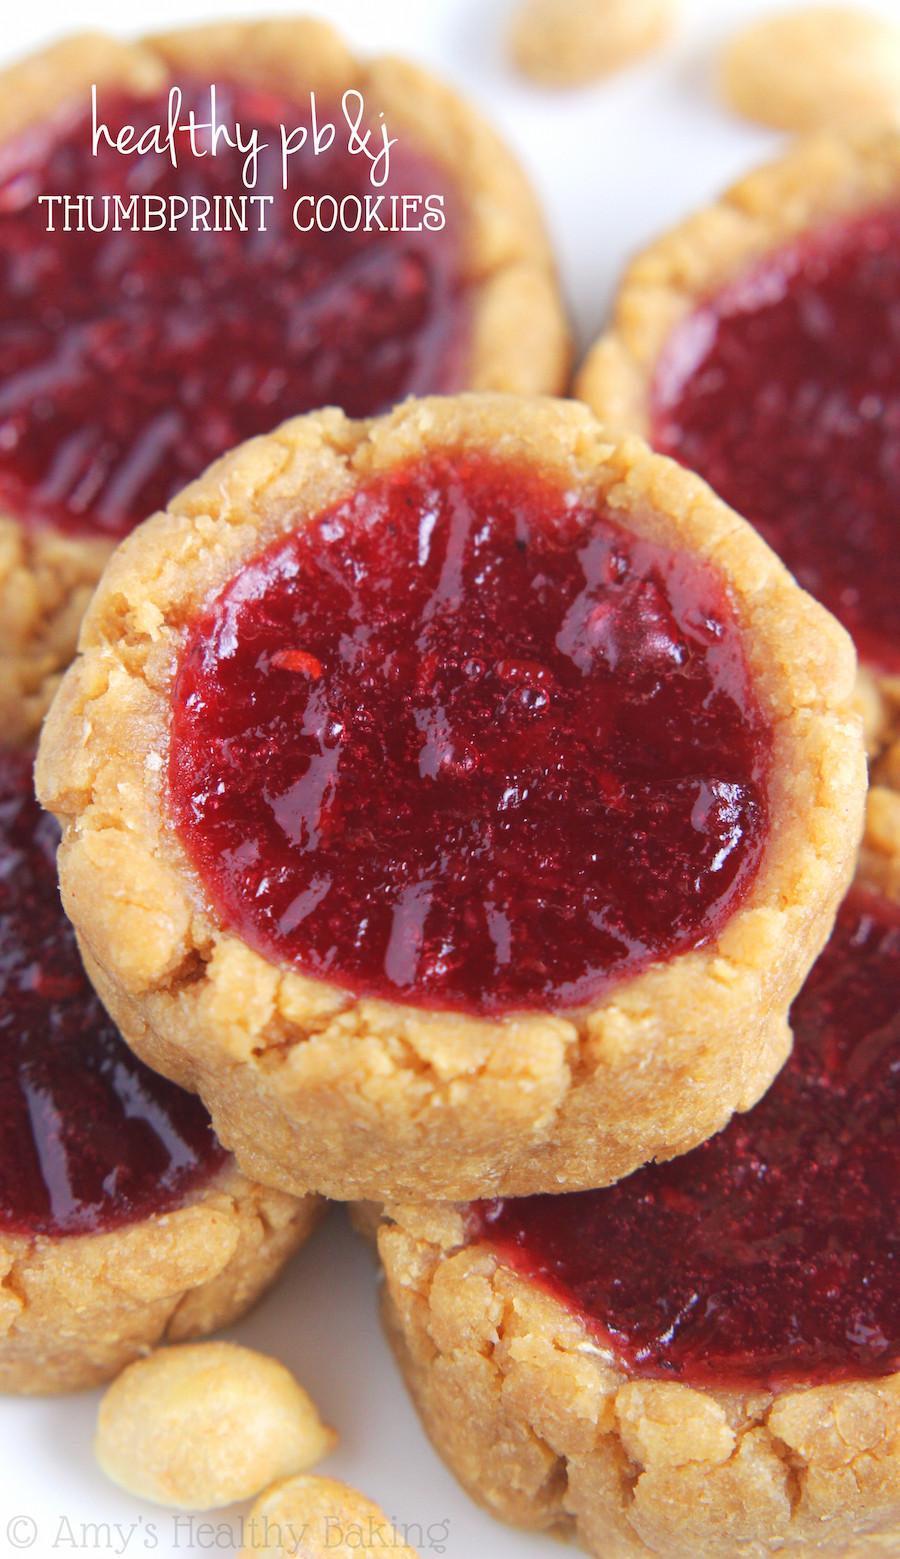 Healthy Thumbprint Cookies  Peanut Butter & Jam Thumbprint Cookies